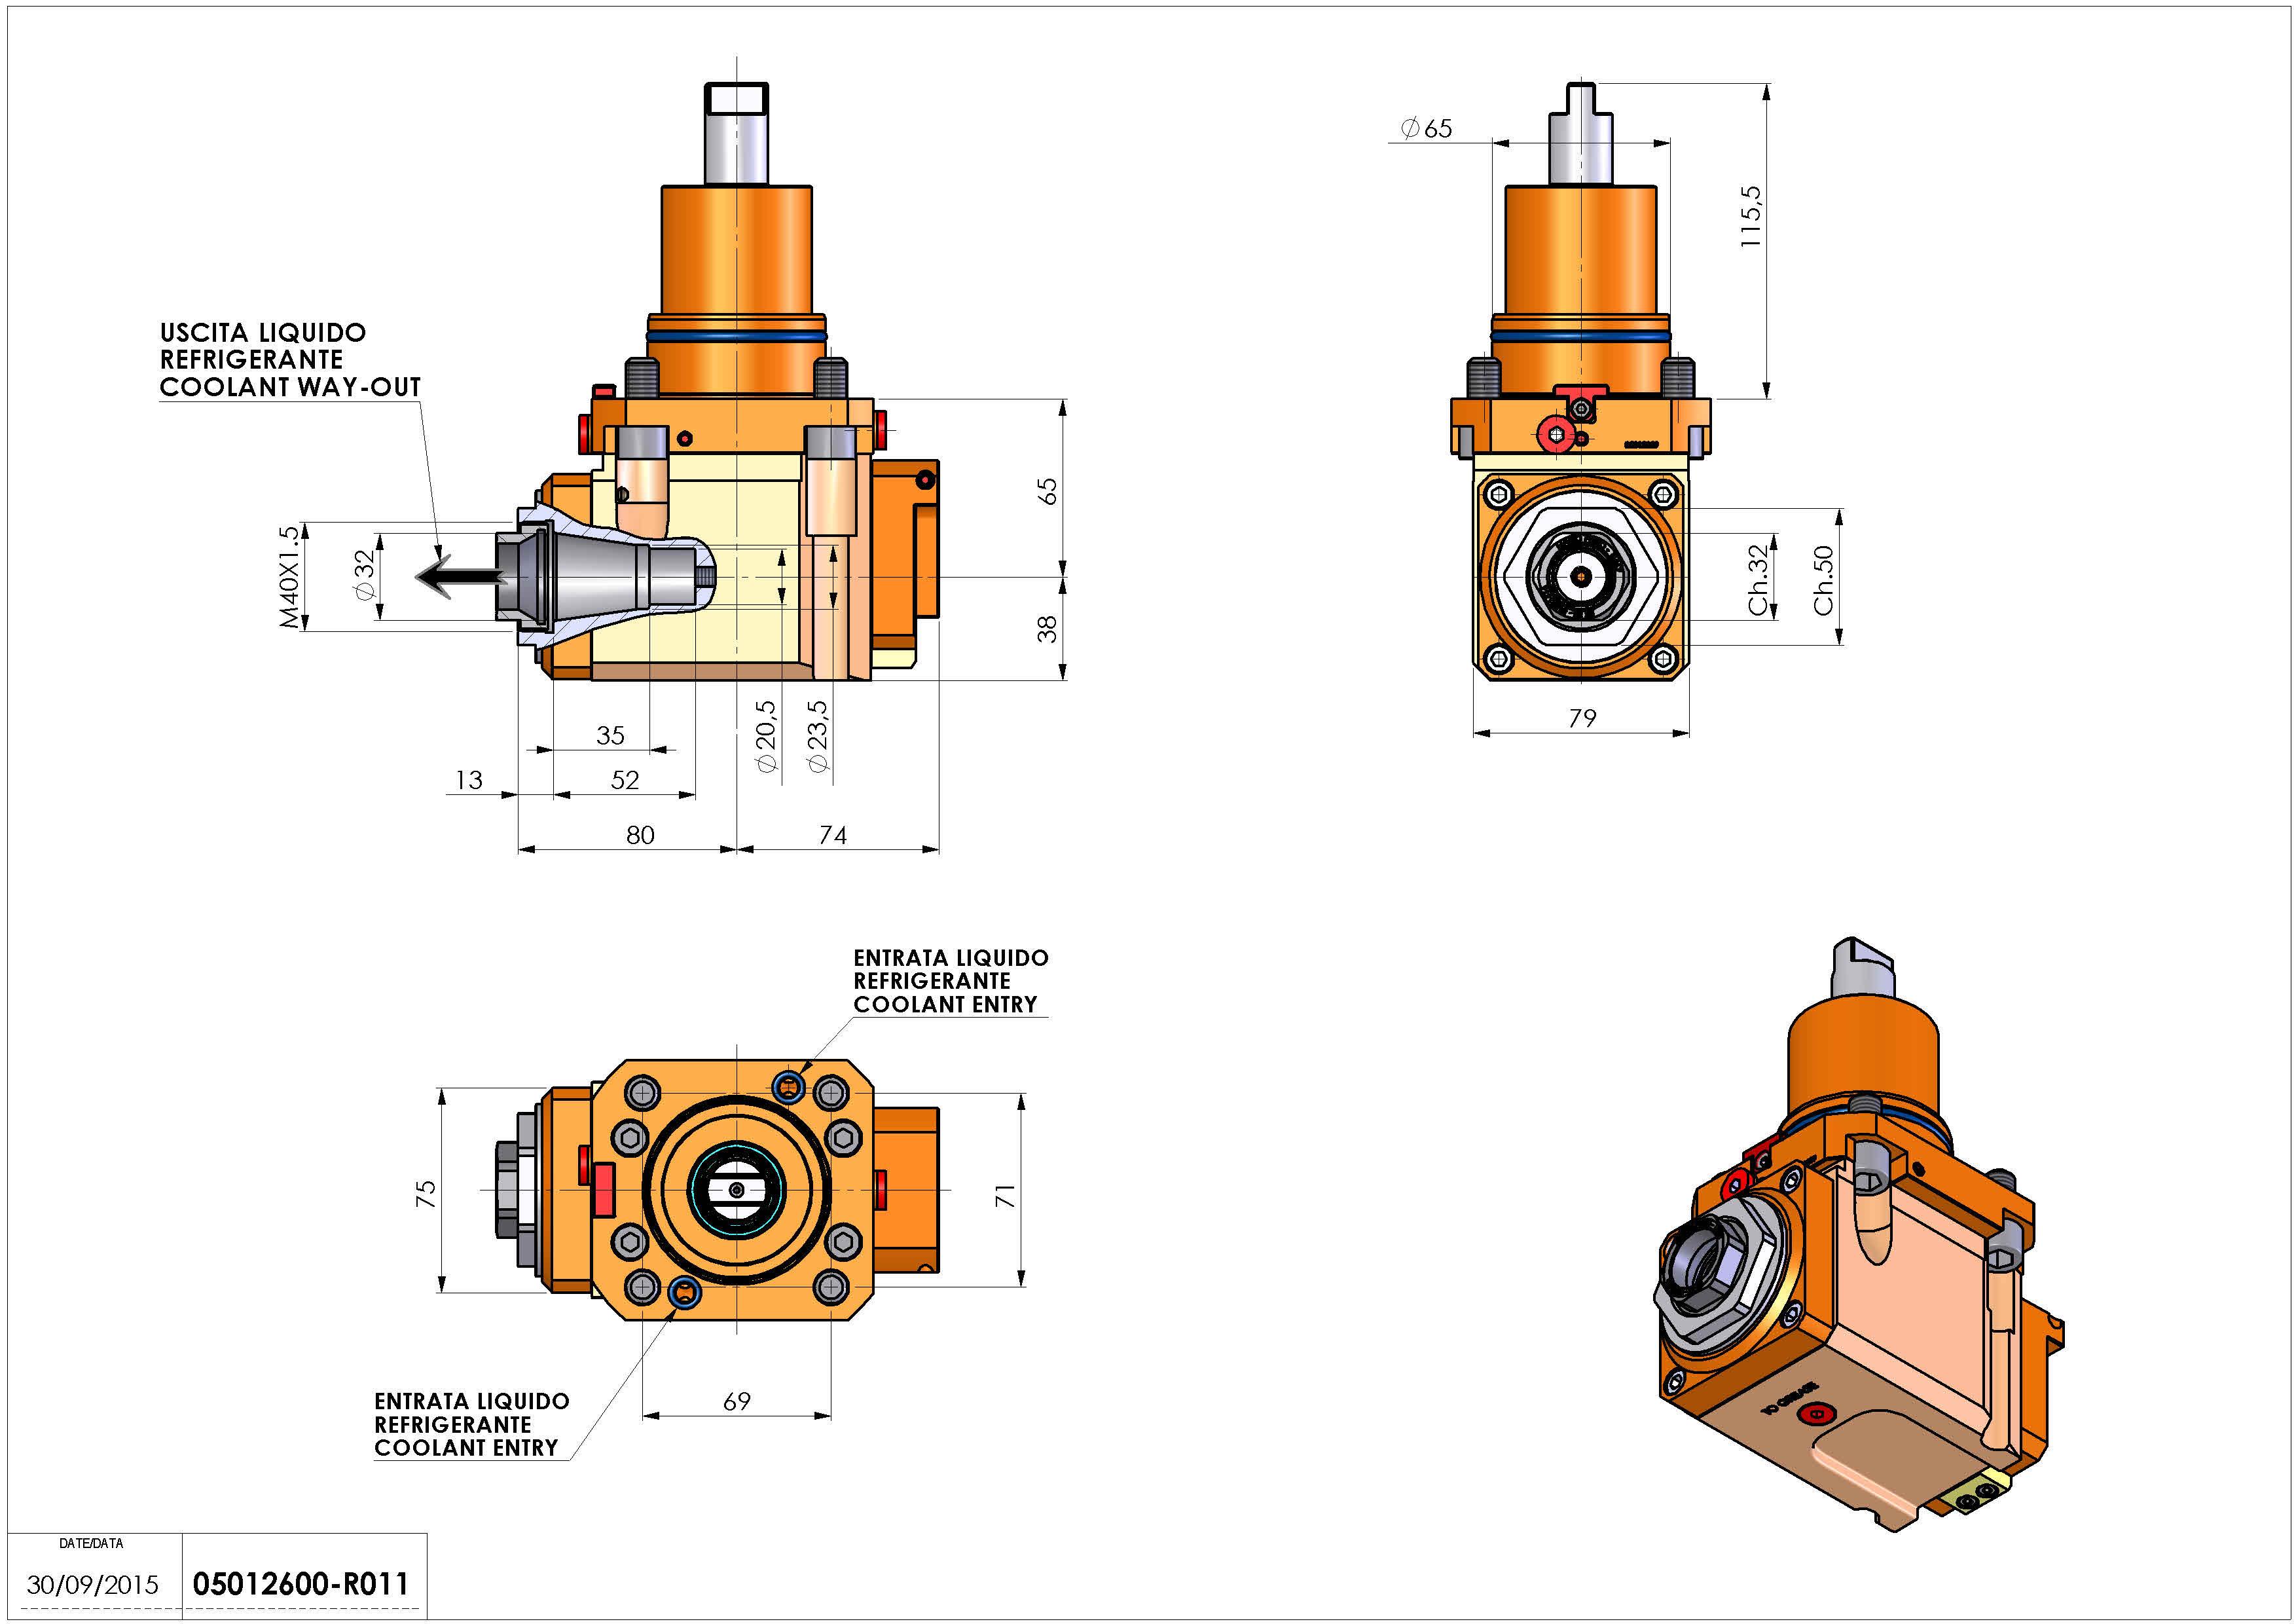 Technical image - LT-A D65 ER32F HRF LR H65 NK.